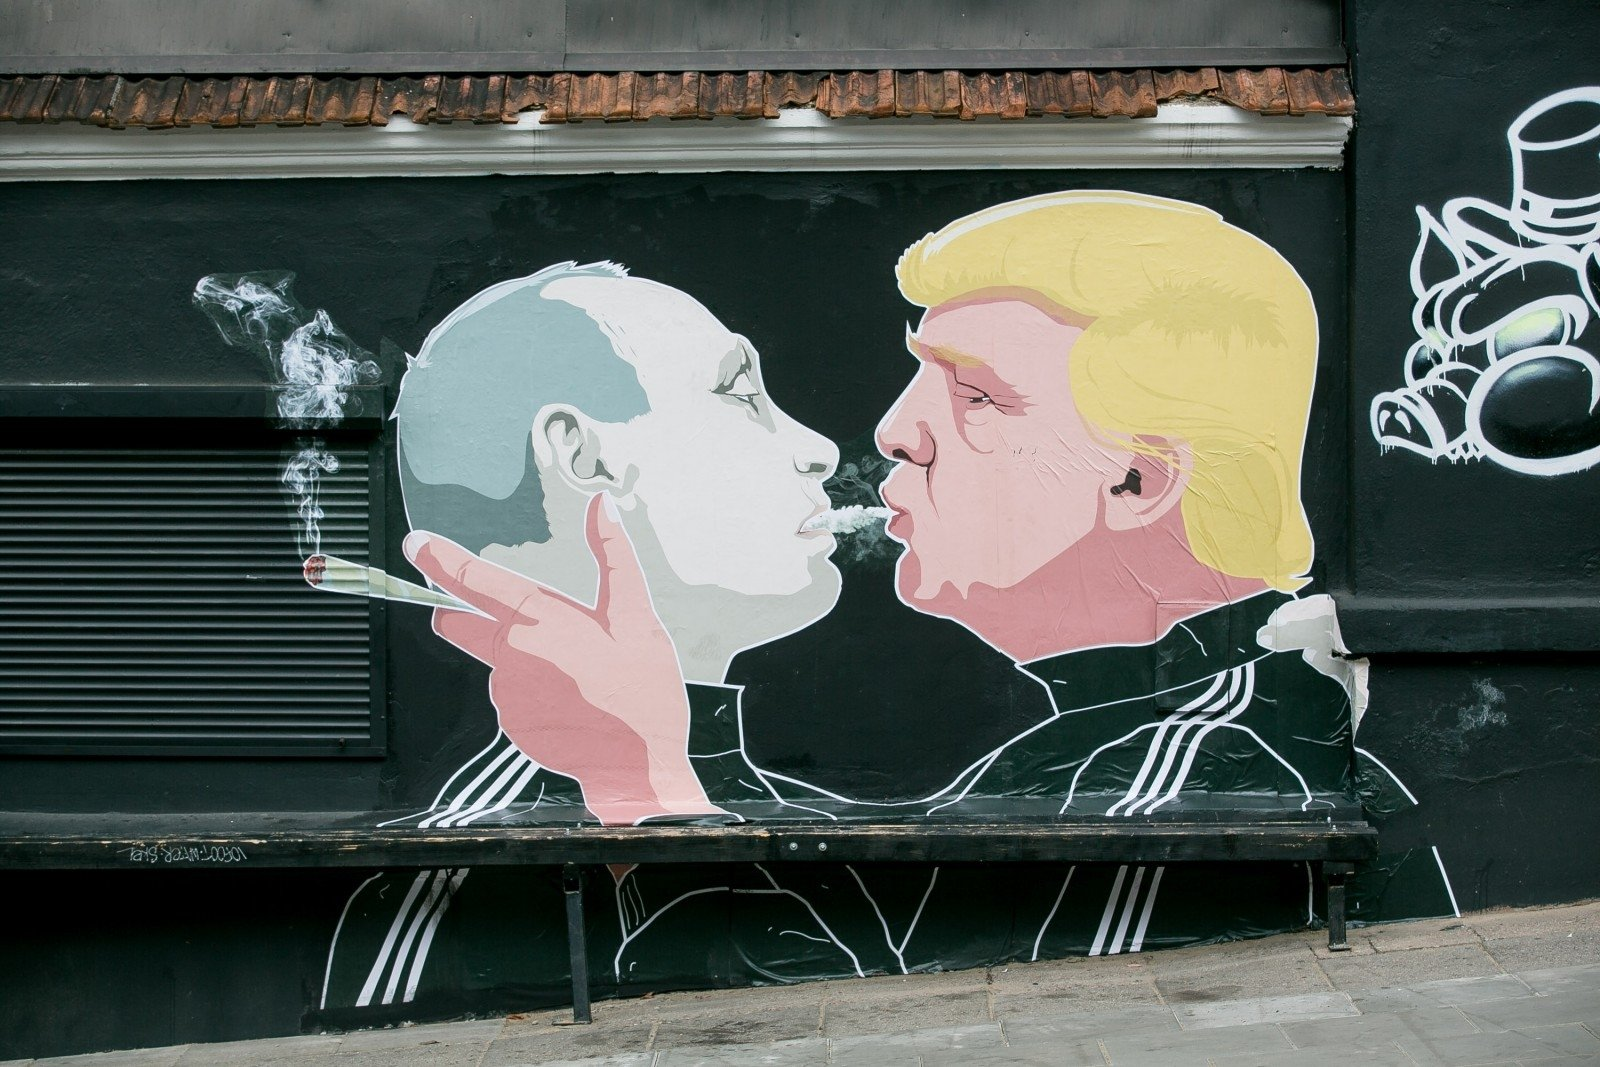 http://time.com/4336396/lithuania-mural-donald-trump-vladimir-putin-kiss/  Now it looks like this https://g3.dcdn.lt/images/pix/keule-ruke-atnaujinto-paveikslo-atidengimas-72322760.jpg